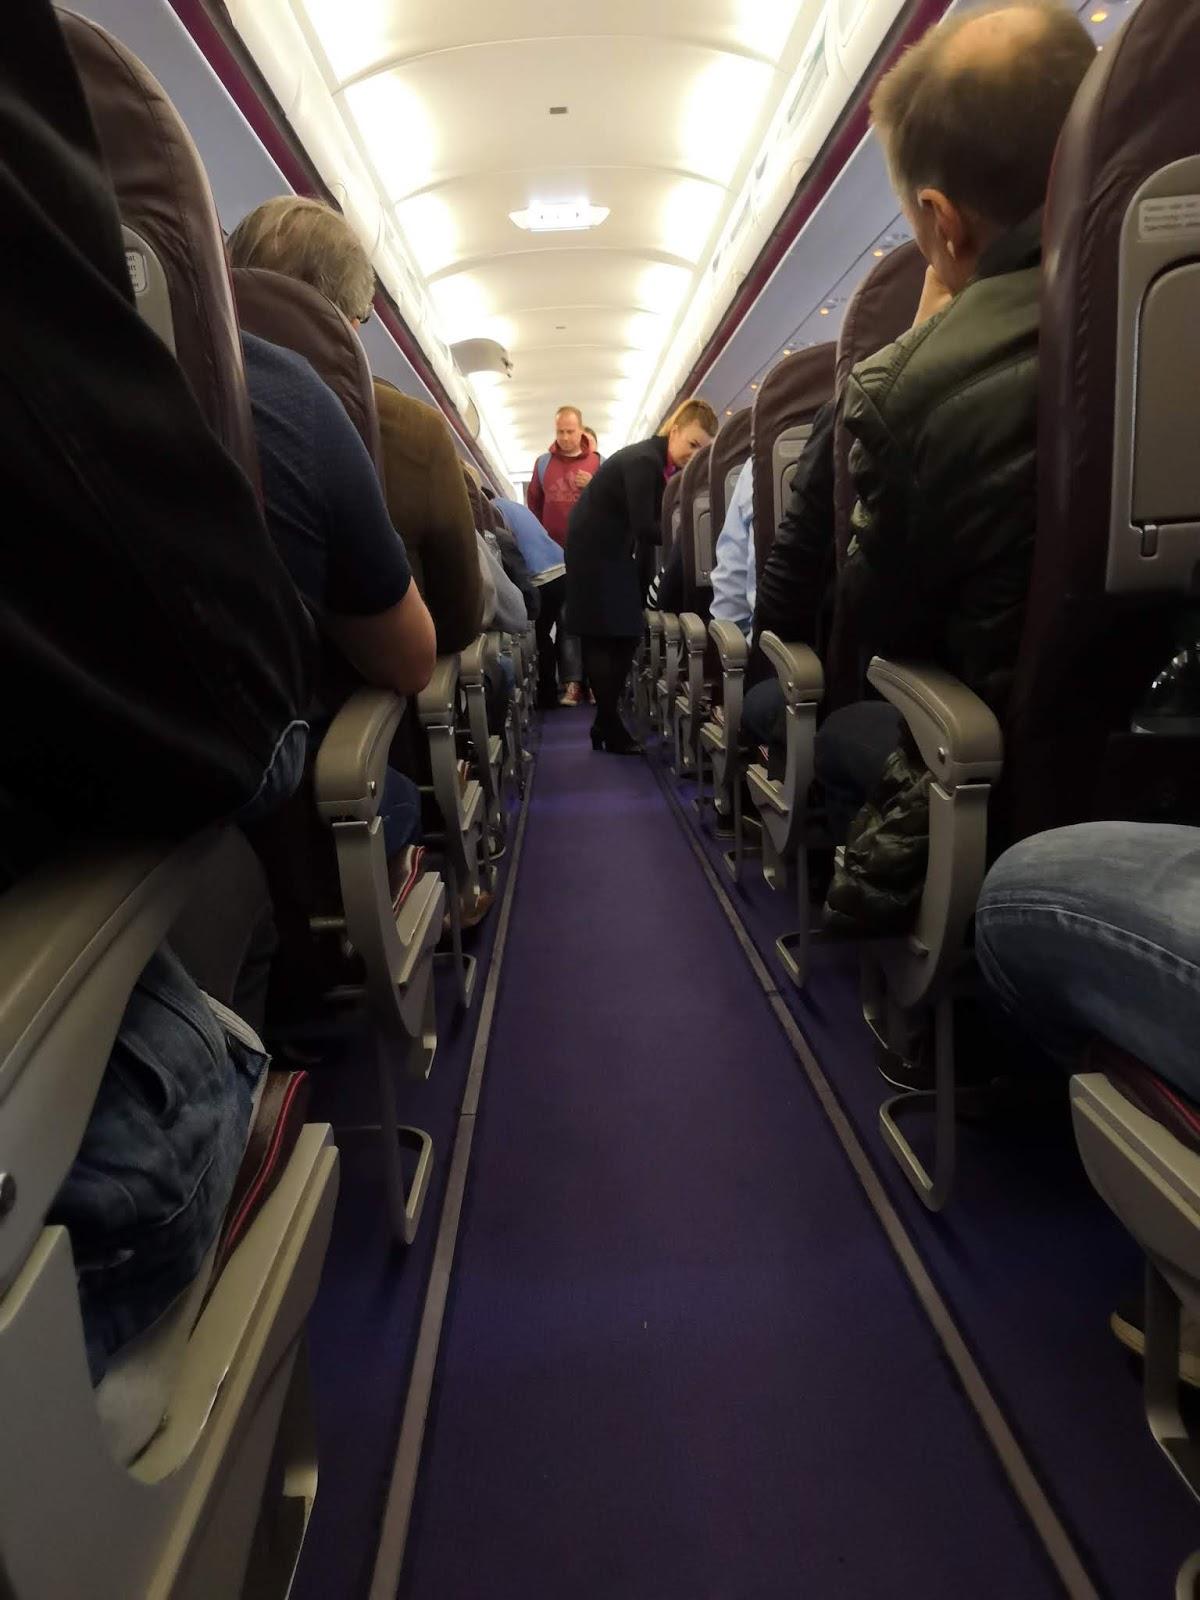 Lento yhtiön miehistö dating site